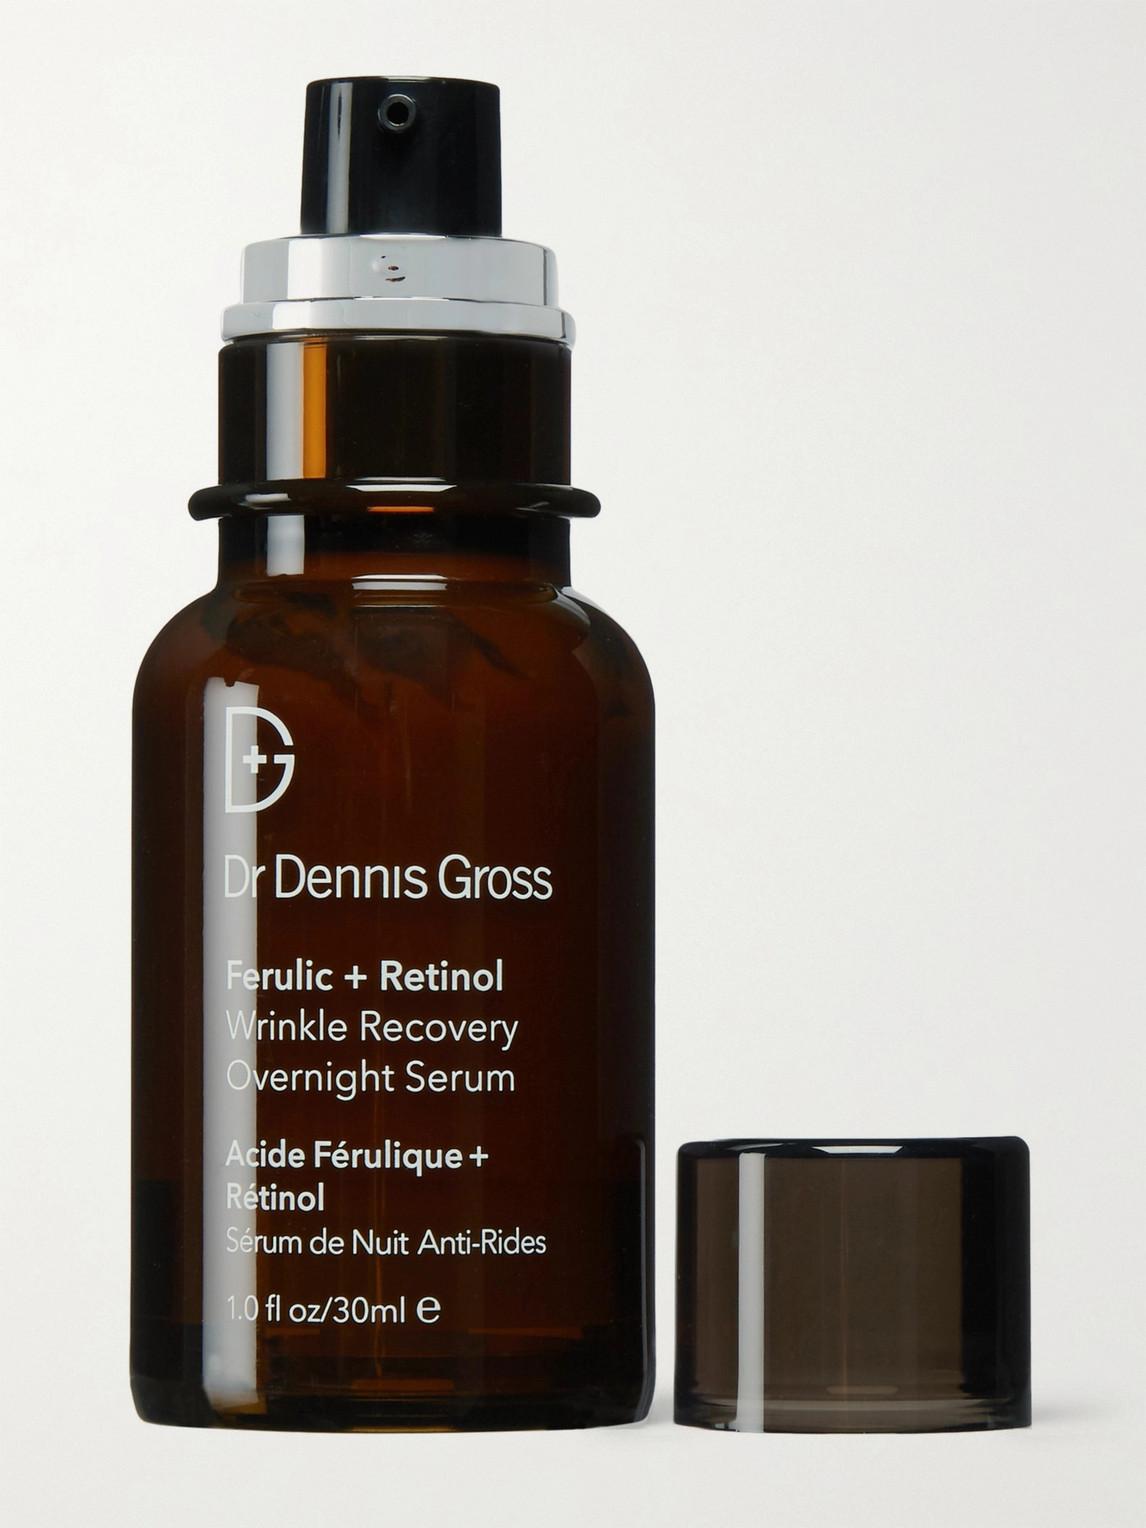 Dr. Dennis Gross Skincare FERULIC RETINOL WRINKLE RECOVERY OVERNIGHT SERUM, 30ML